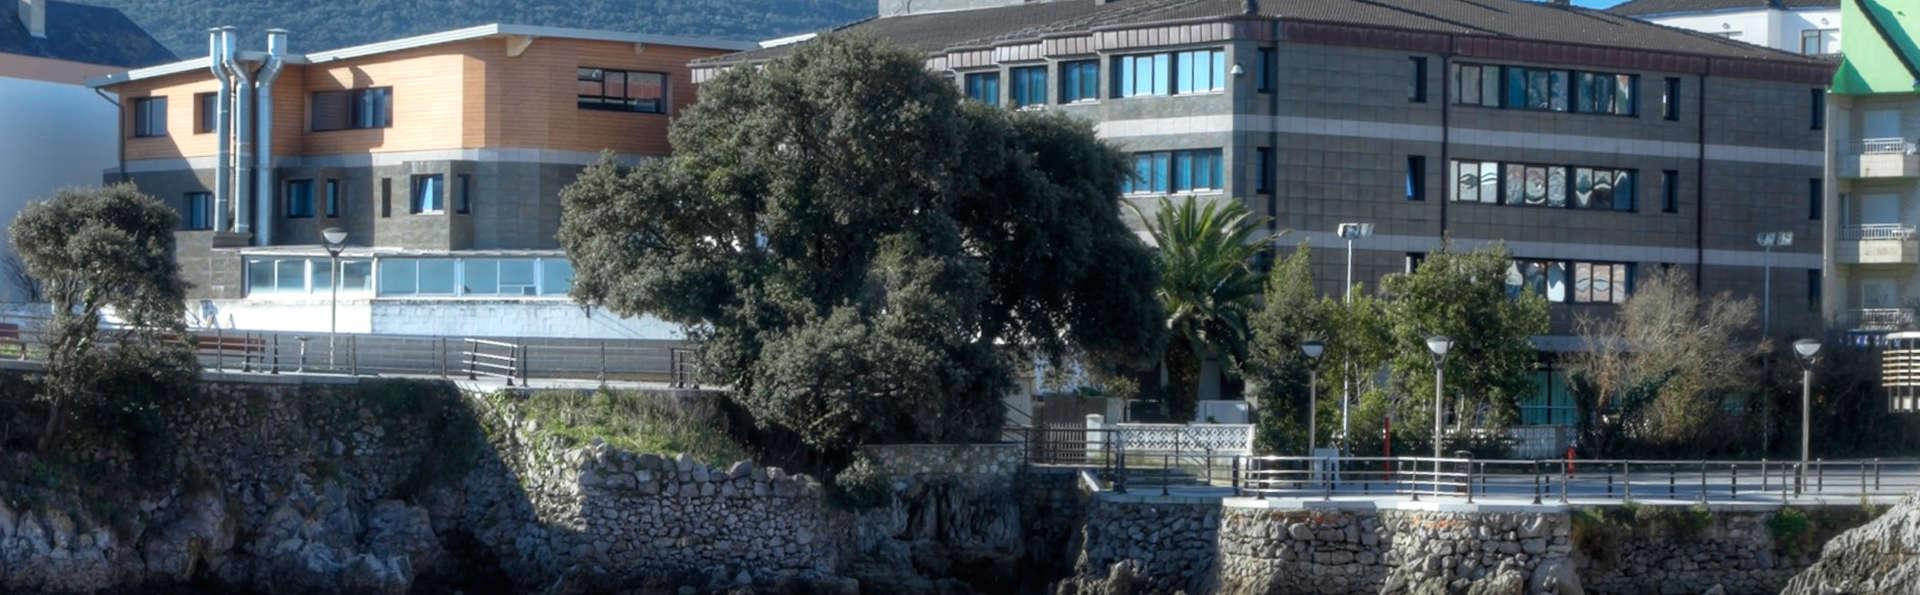 Hotel Isla Bella & Spa - EDIT_front2.jpg